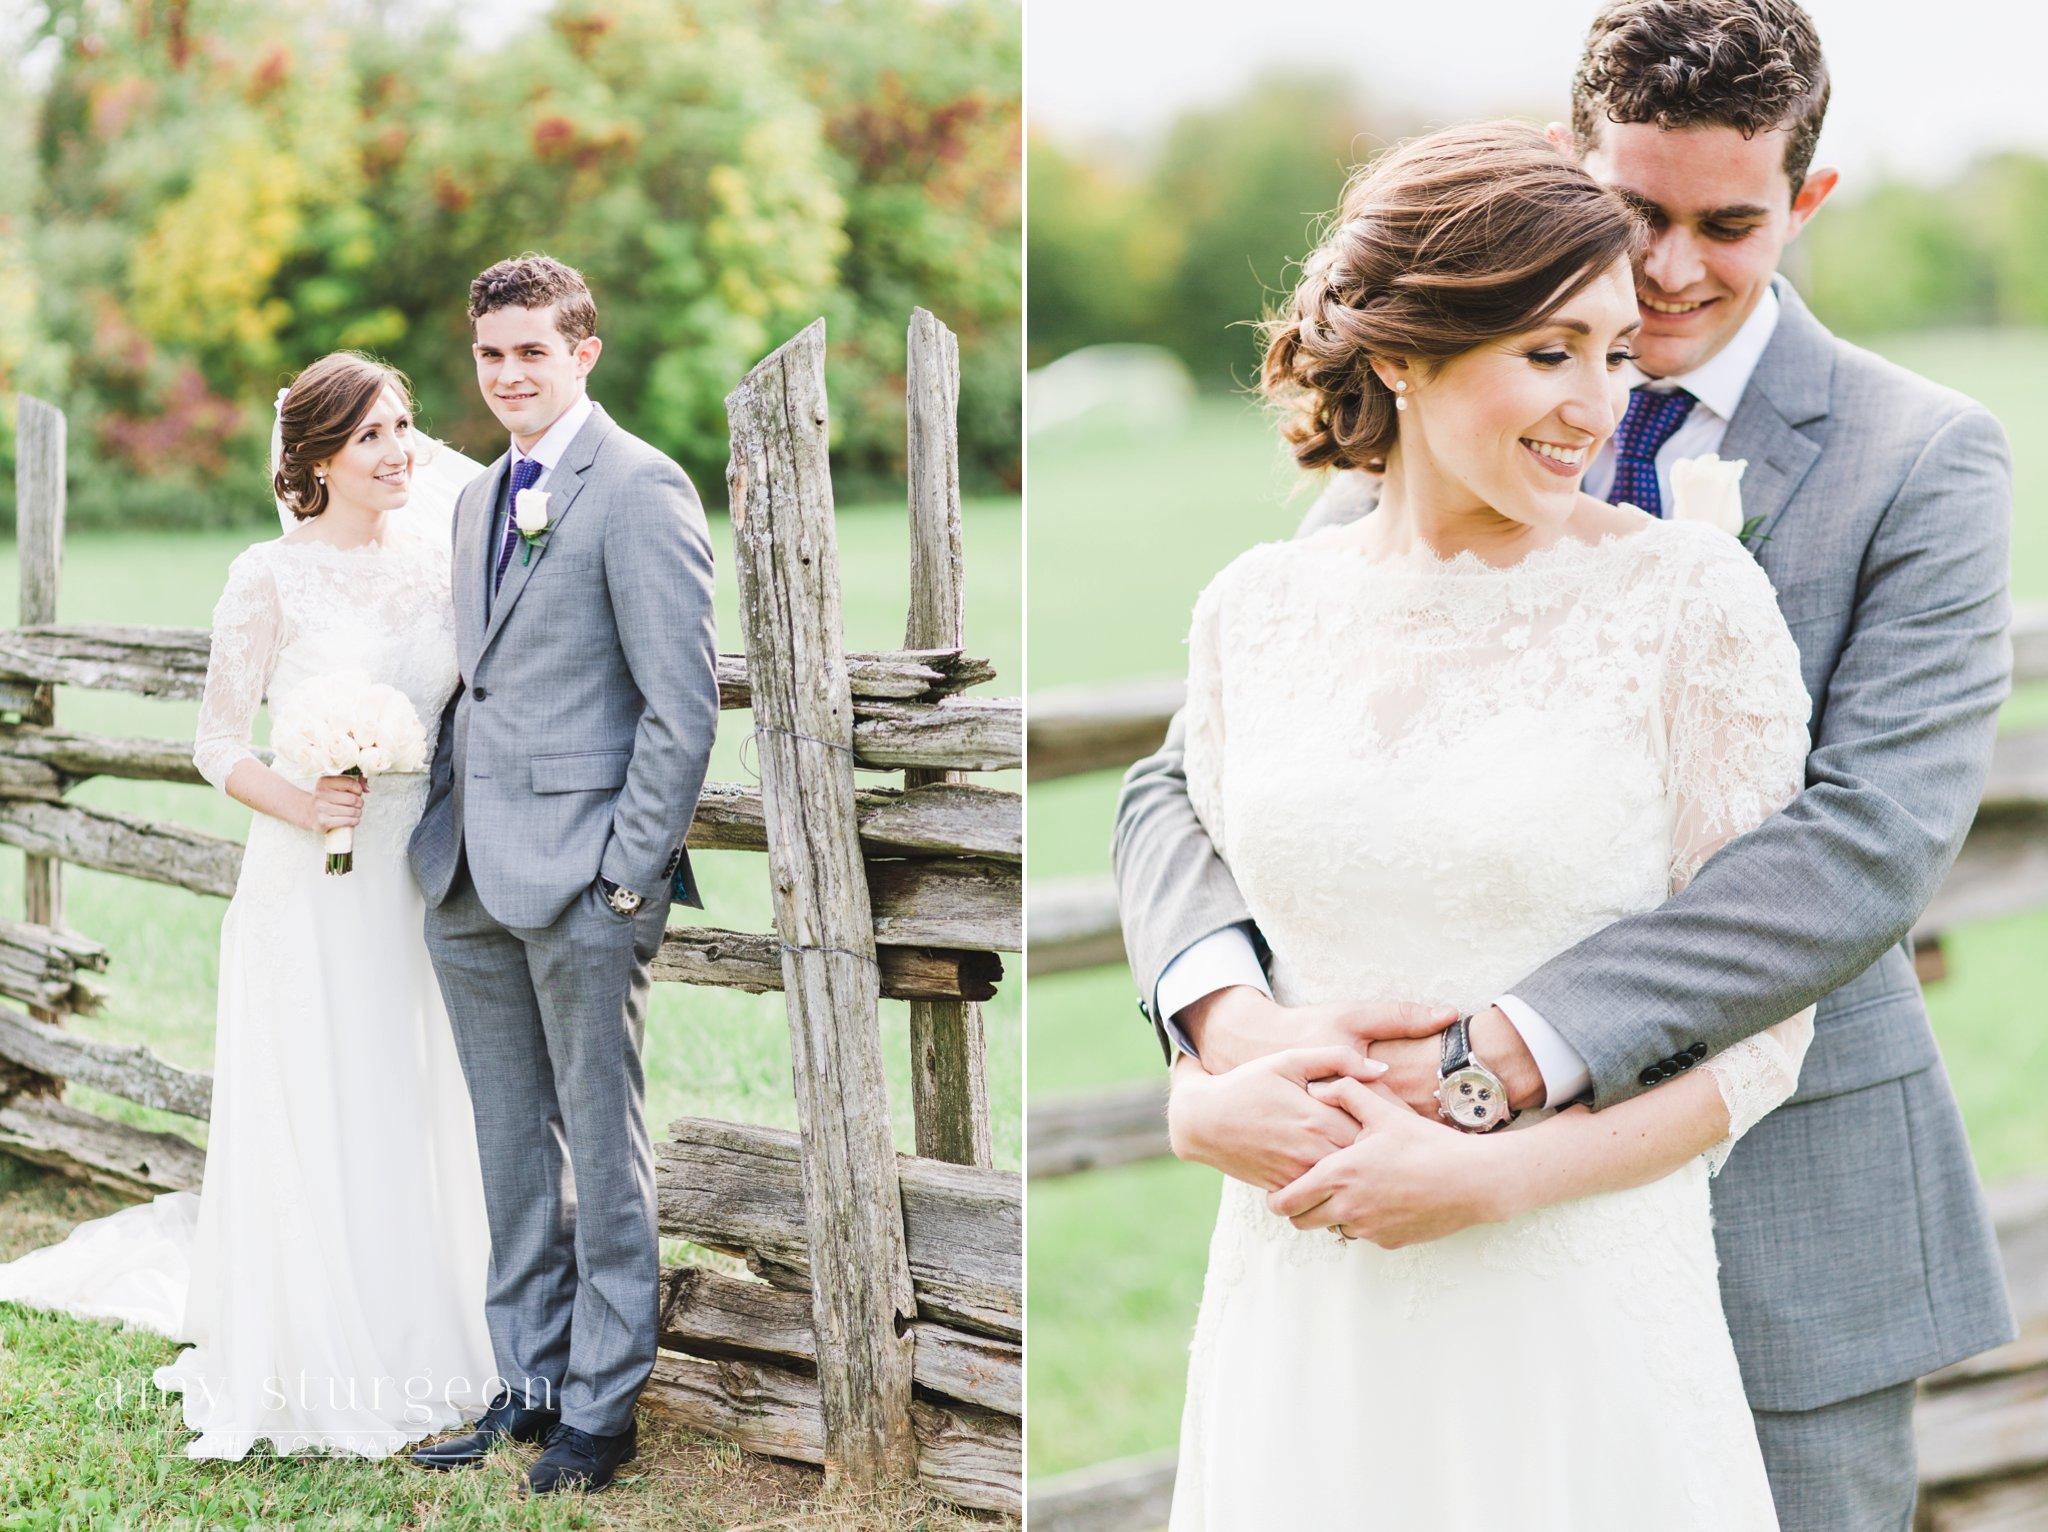 A light grey suit for the groom at the alpaca farm wedding